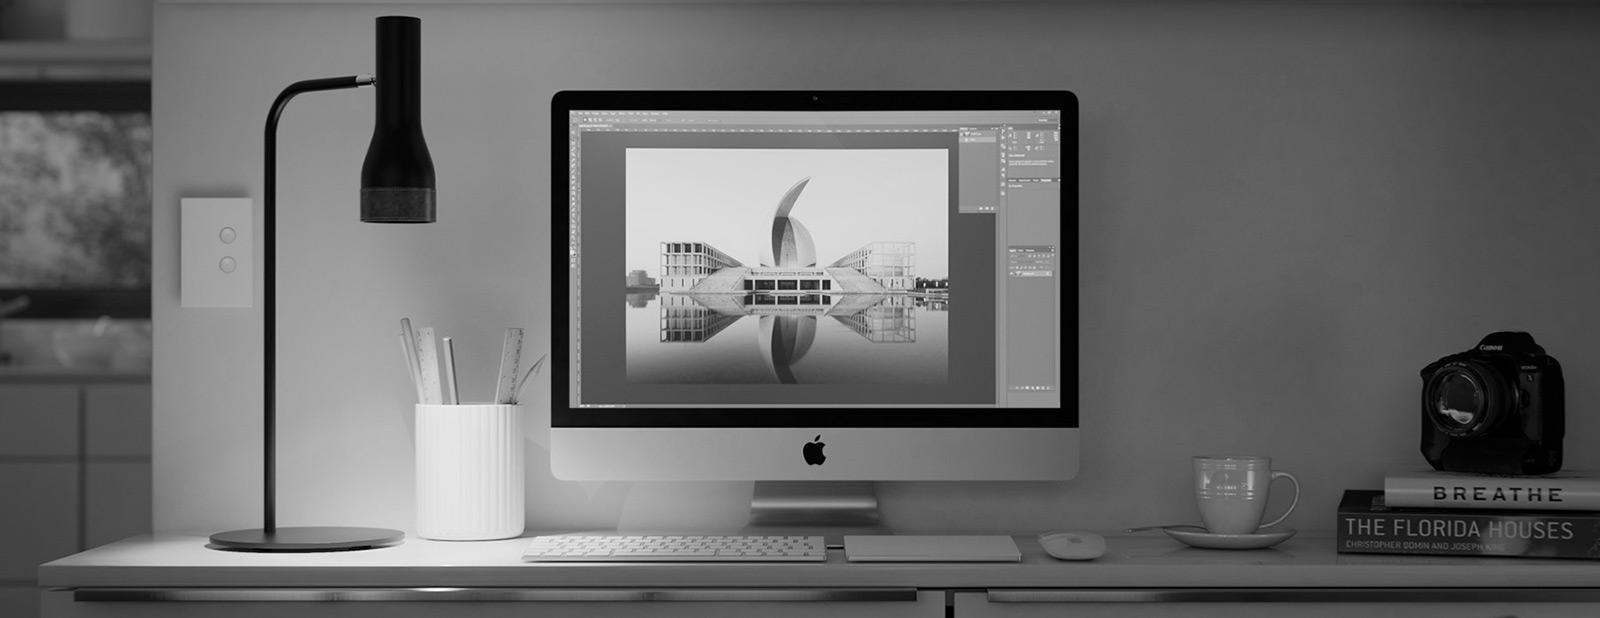 ScreenAge 3D Rendering Company Australia